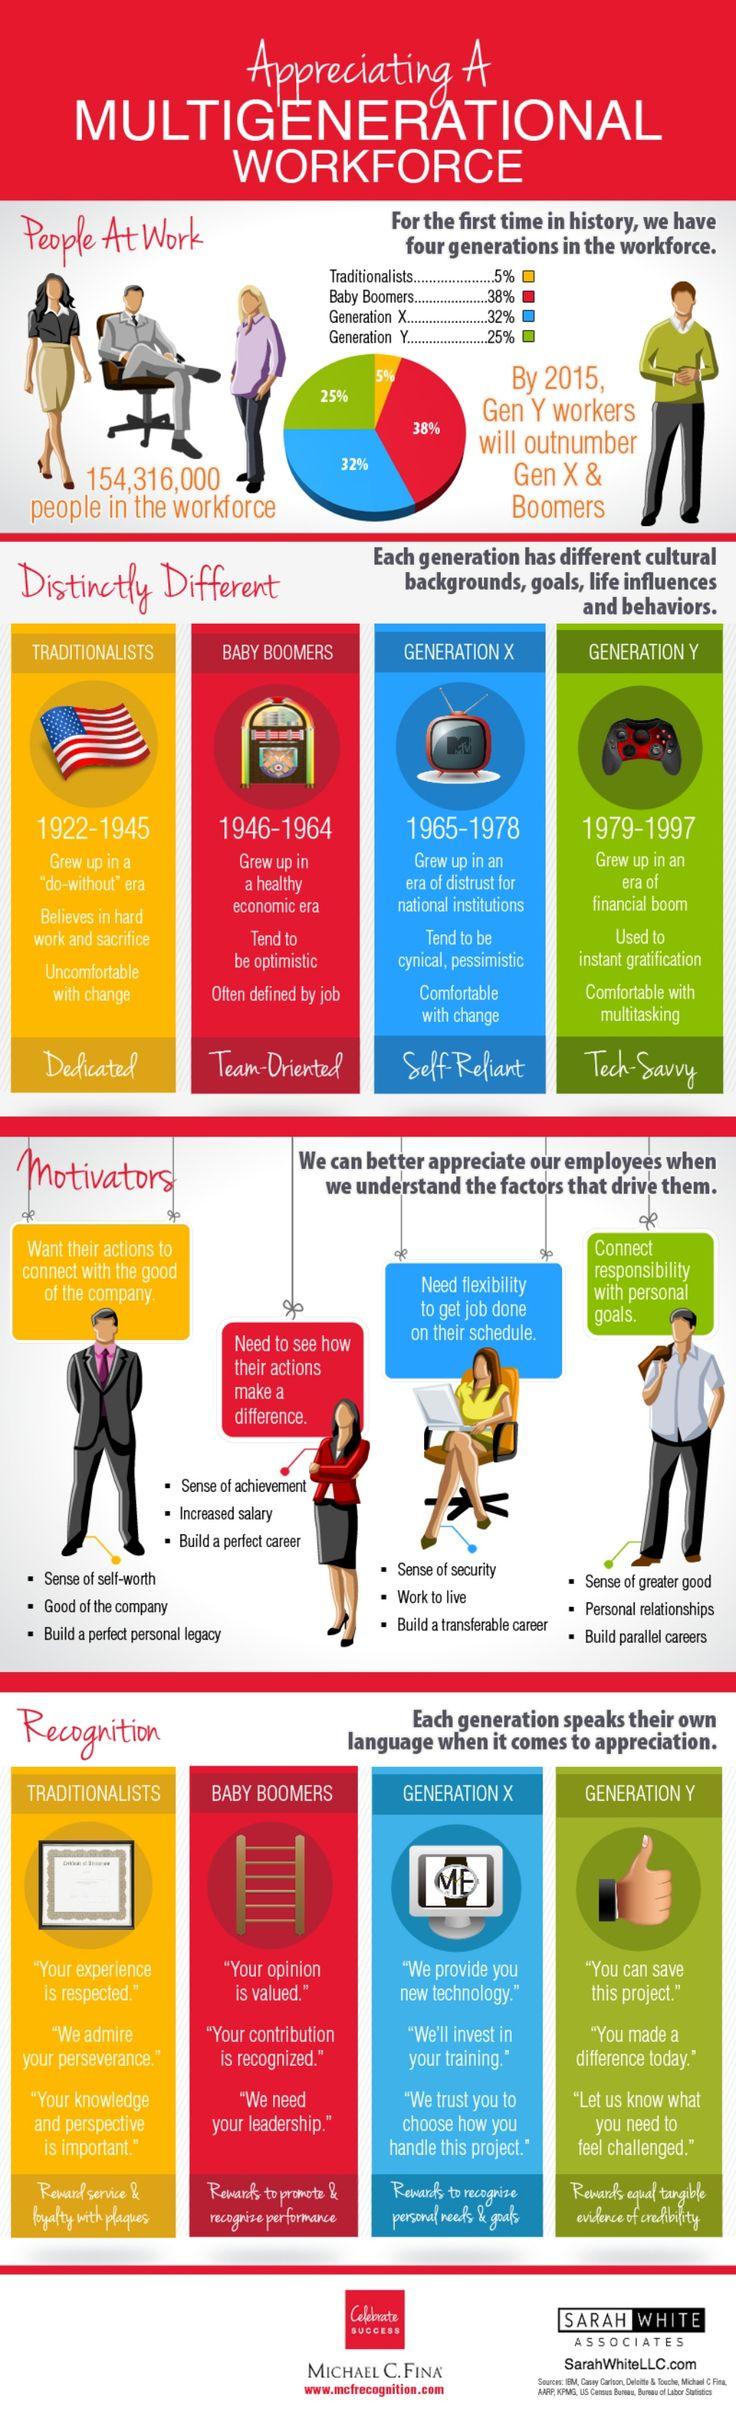 Non Monetary Employee Benefits To Increase Staff Retention